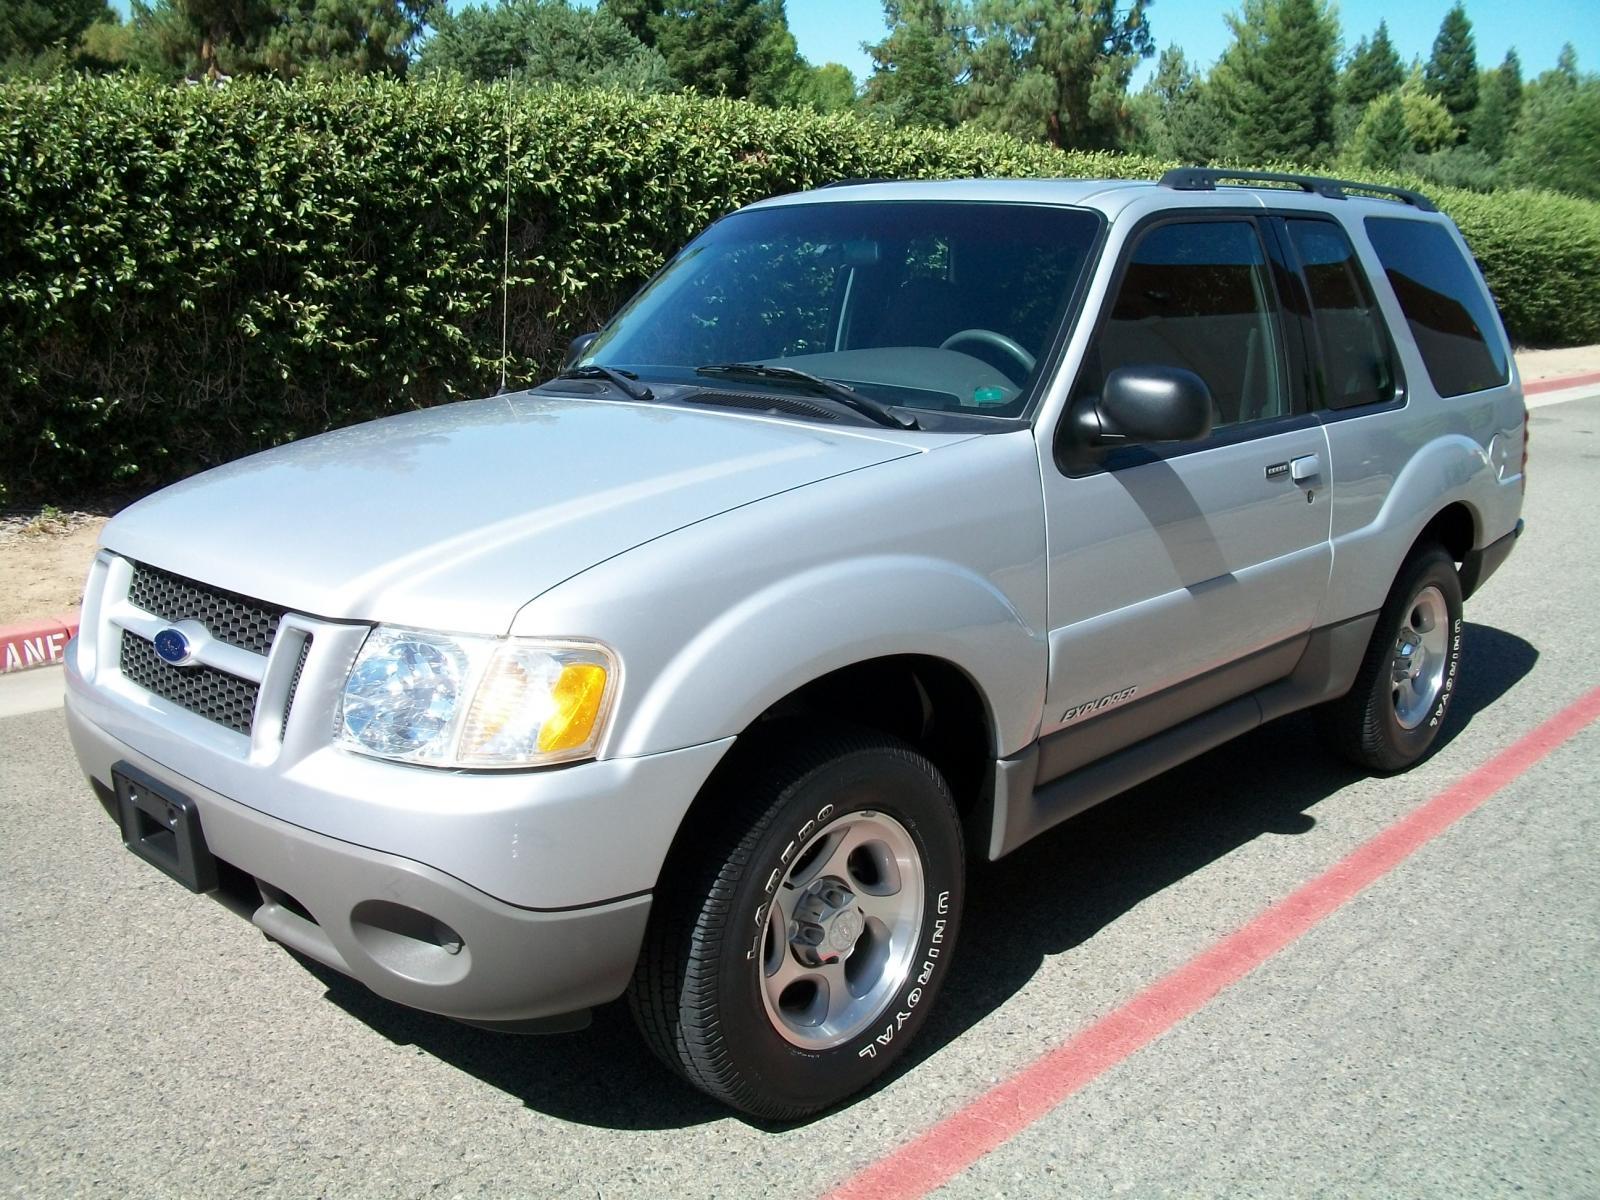 800 1024 1280 1600 Origin 2002 Ford Explorer ...